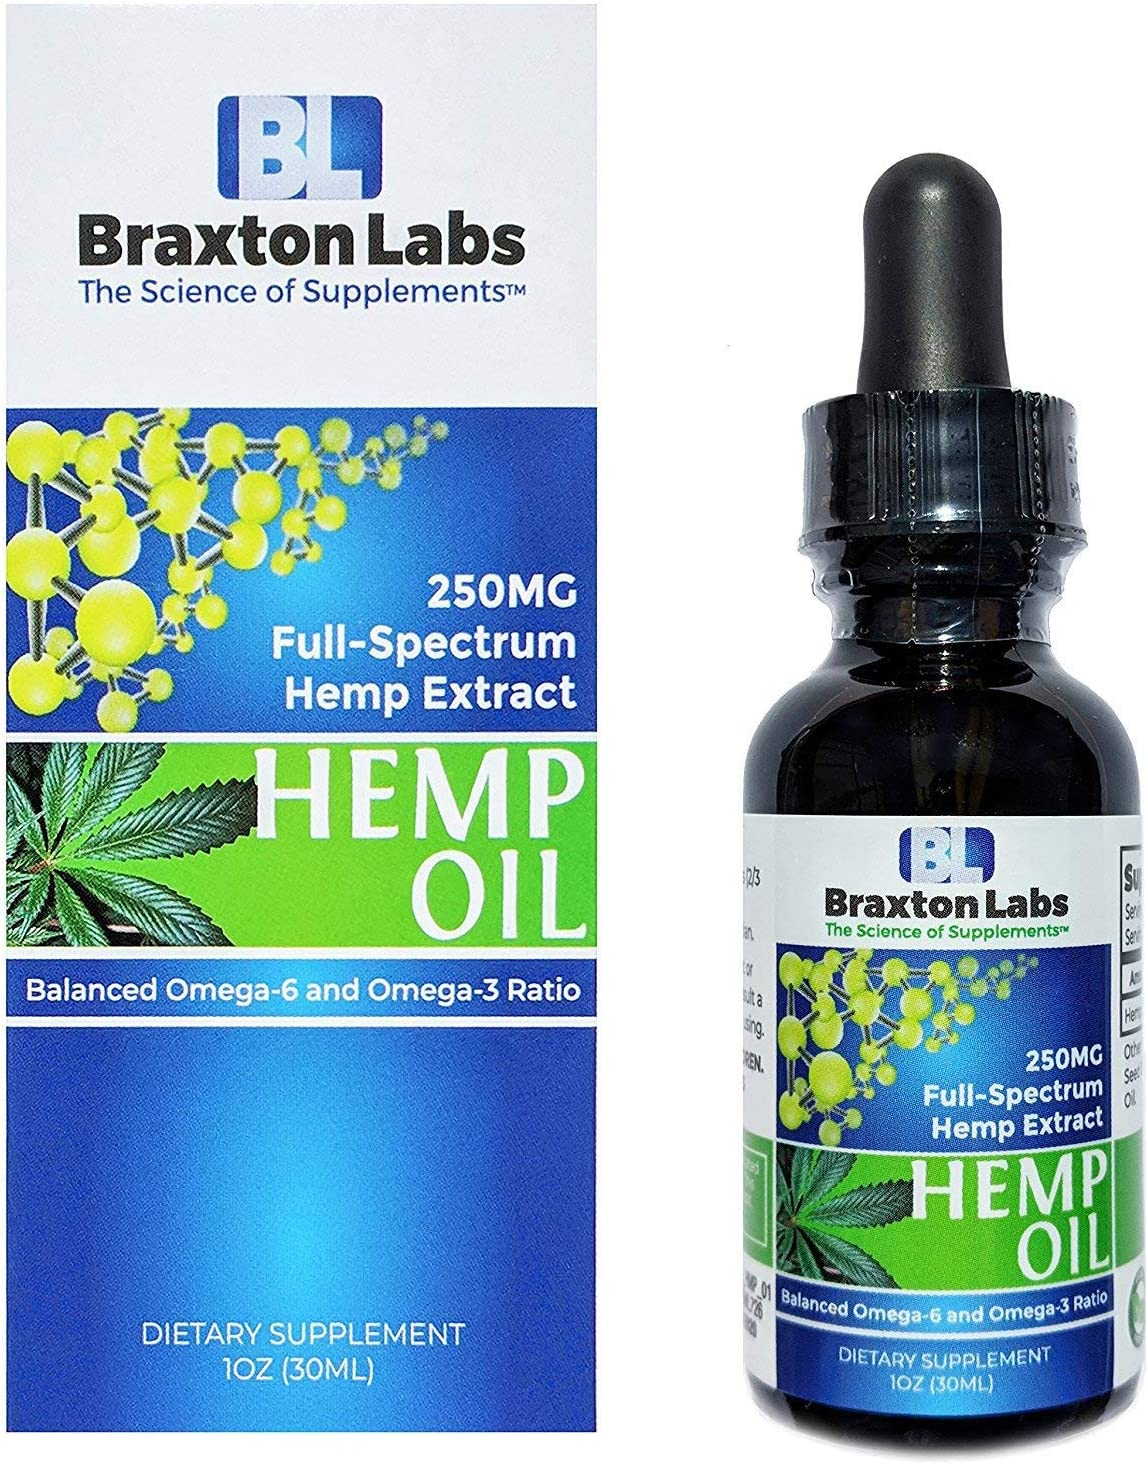 Braxton Labs Premium Hemp Oil 250MG Full-Spectrum Balanced Omega-6 Omega-3 Ratio 100% Made in The USA